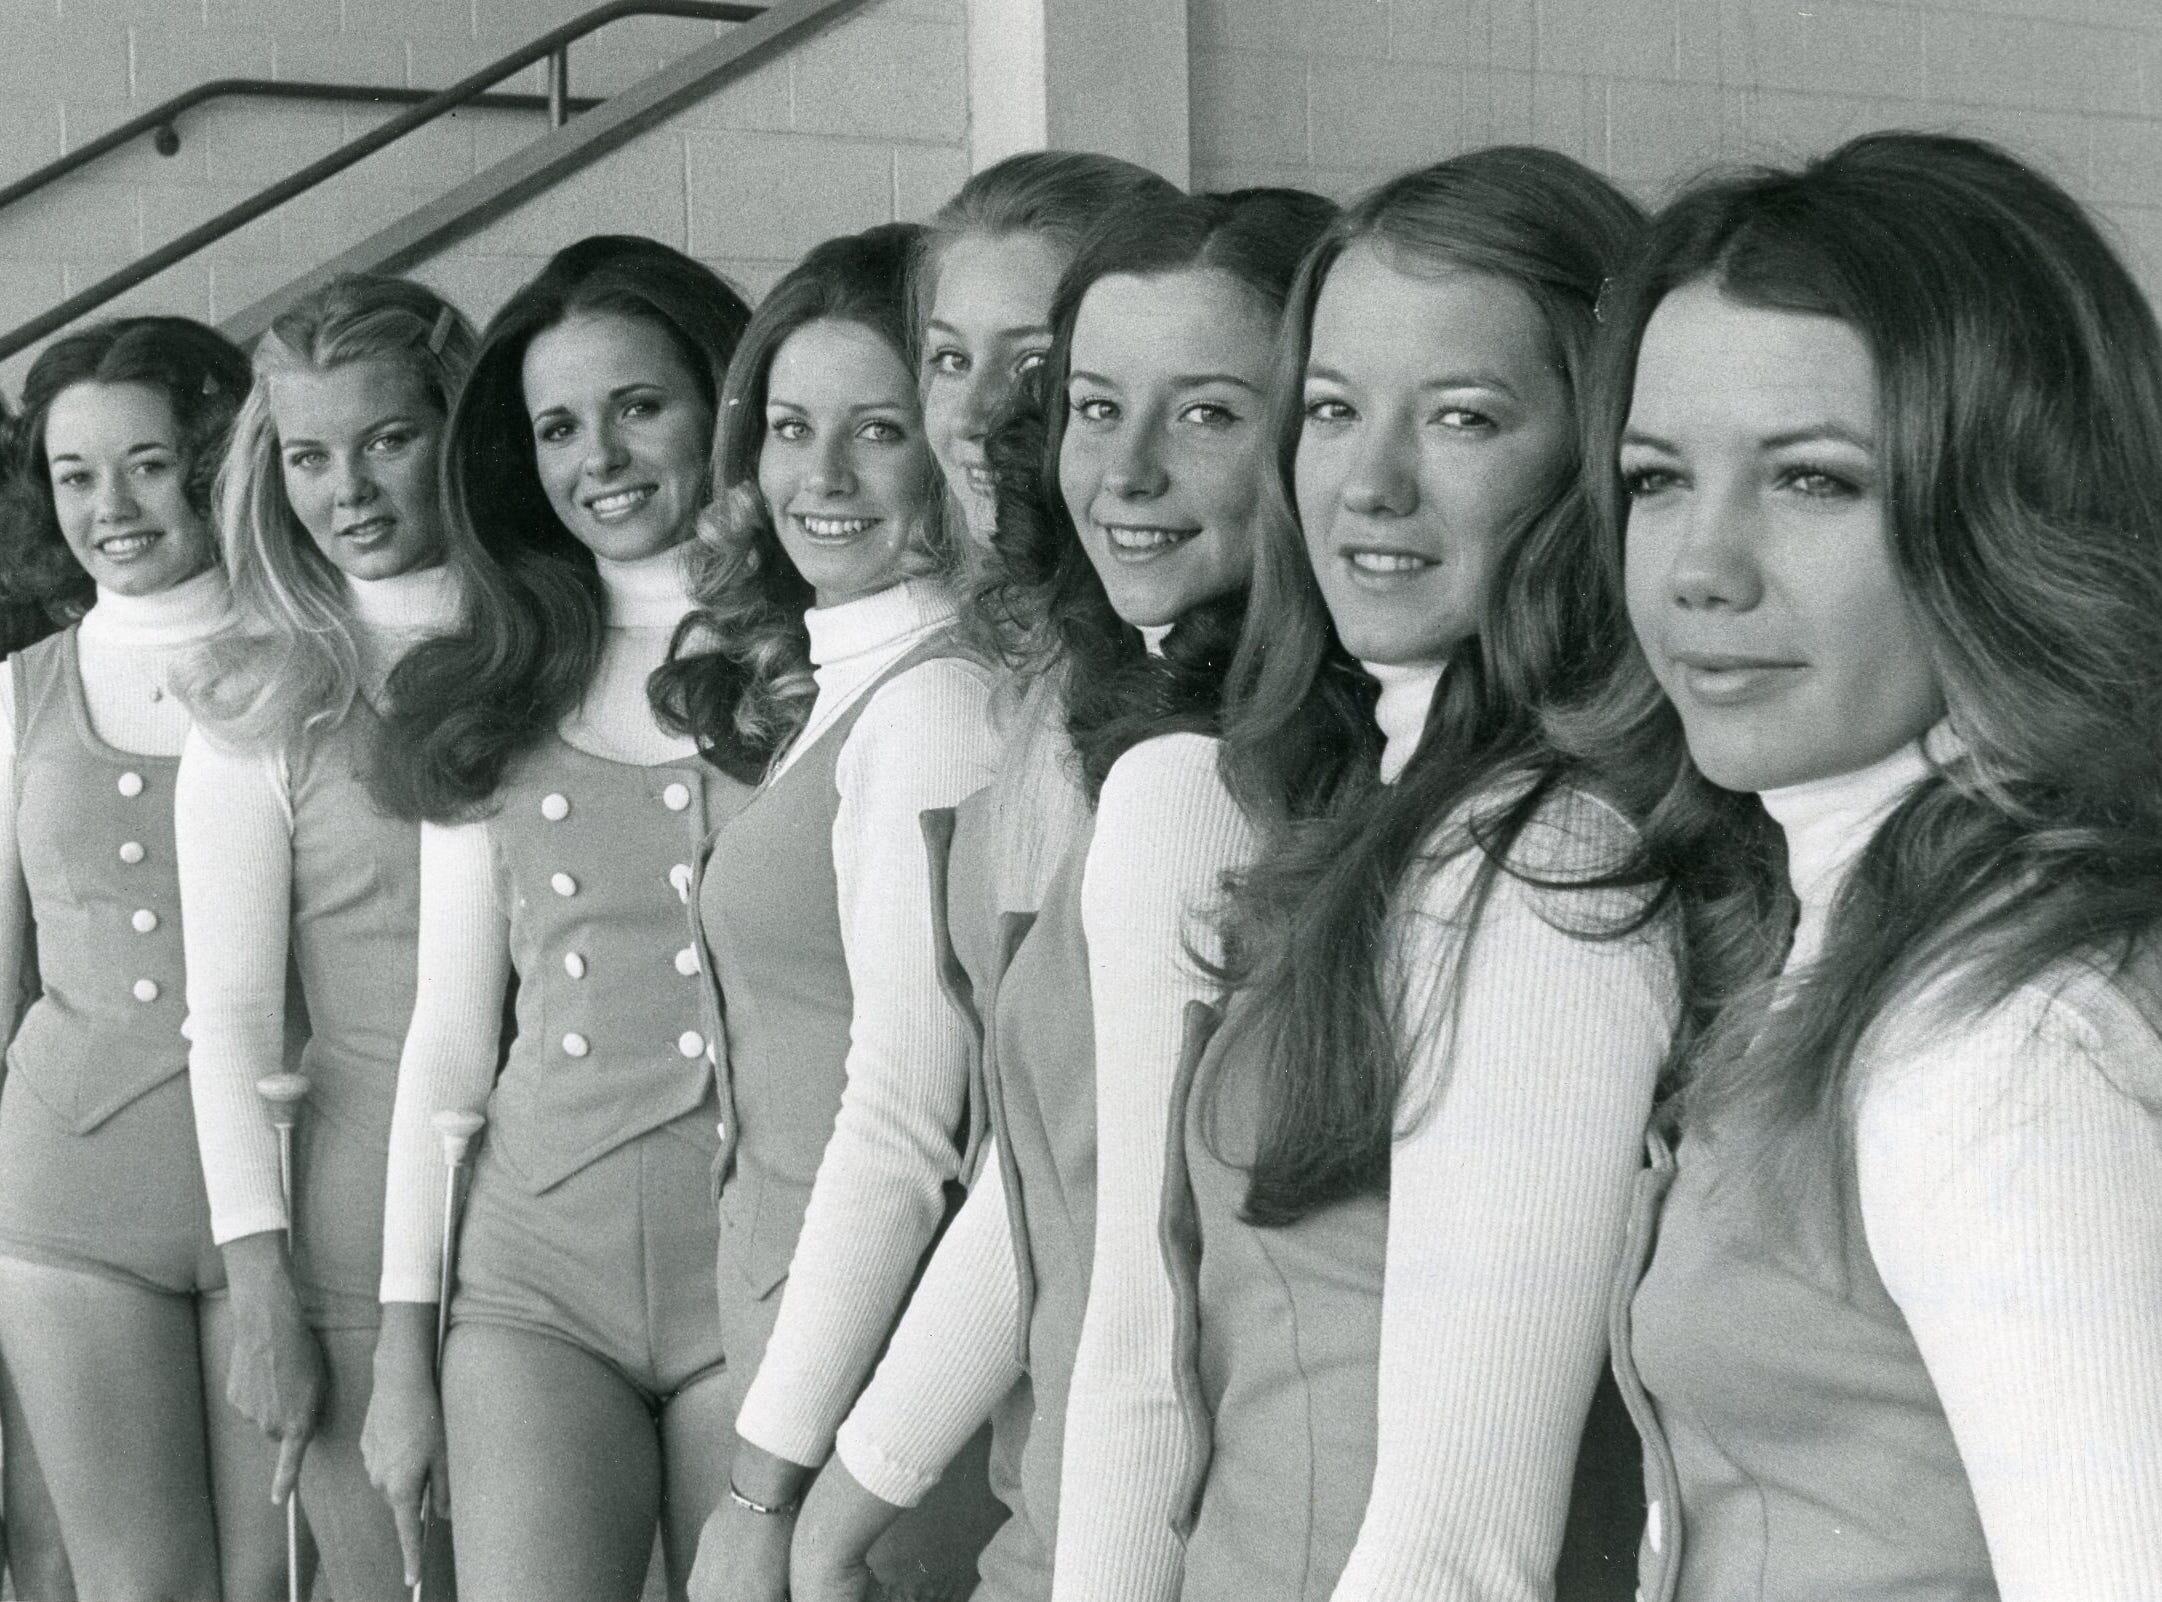 UT majorettes Karen Lee, Karen Crumm, Suzie Smith, Suzanne Minchey, Kathy McCarrell, Barbara Hammer, Theresa Steiner, Lexie Smith and Leah Smith. 1972